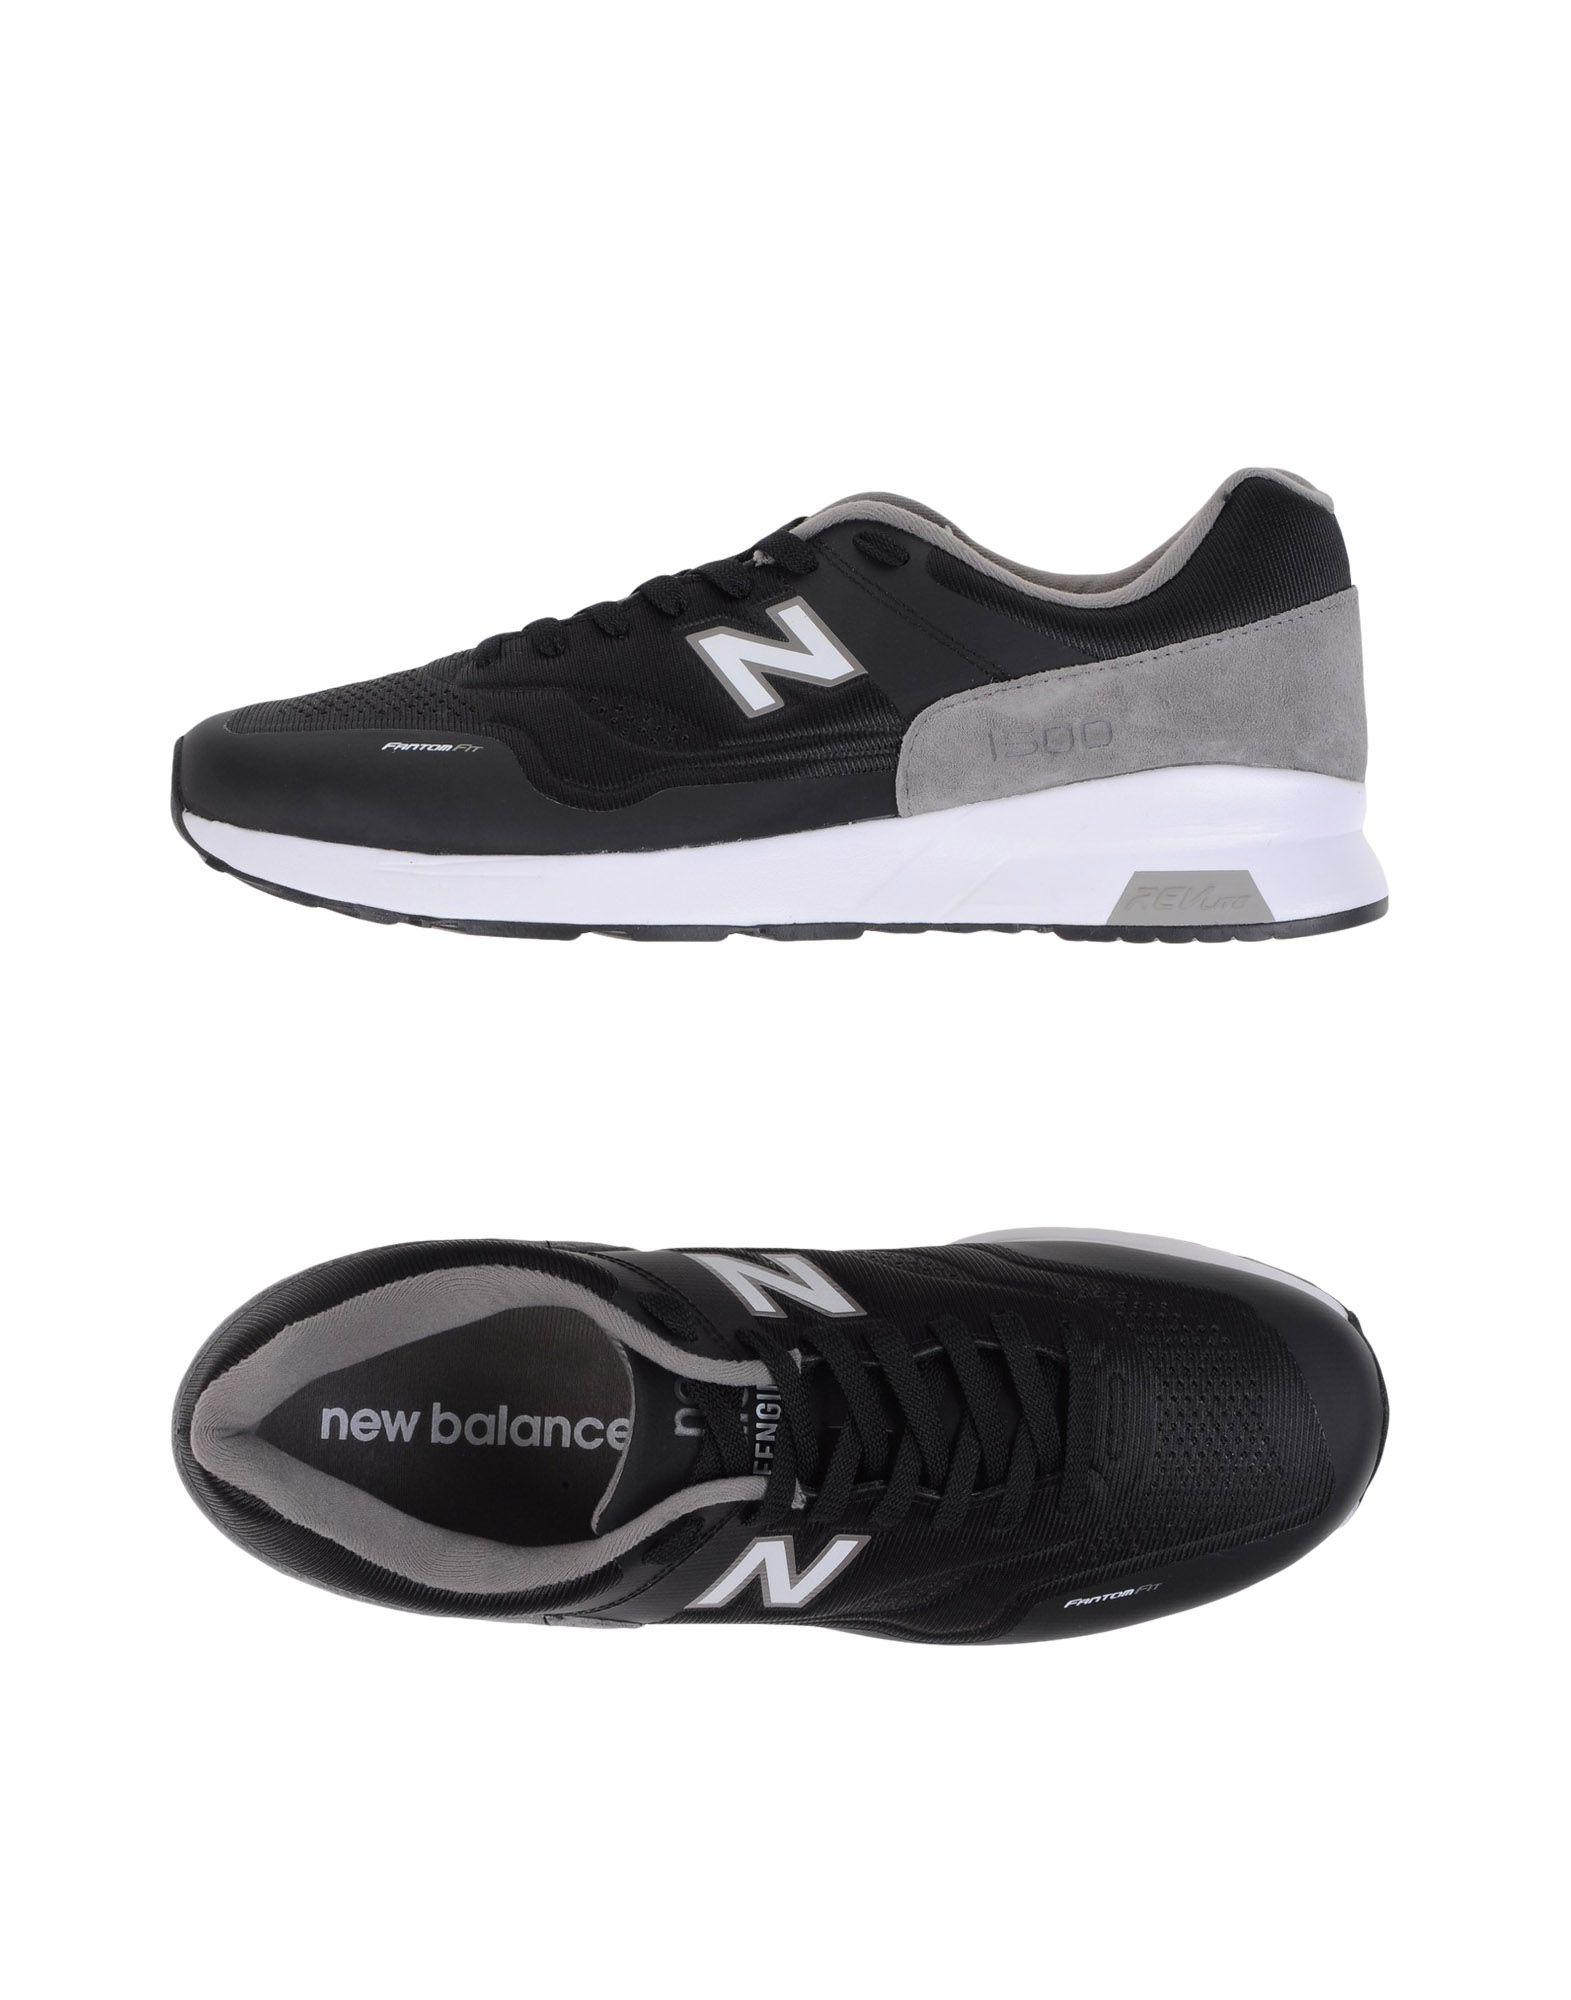 Sneakers New Balance 1500 Reengineered - Uomo - 11088765MD